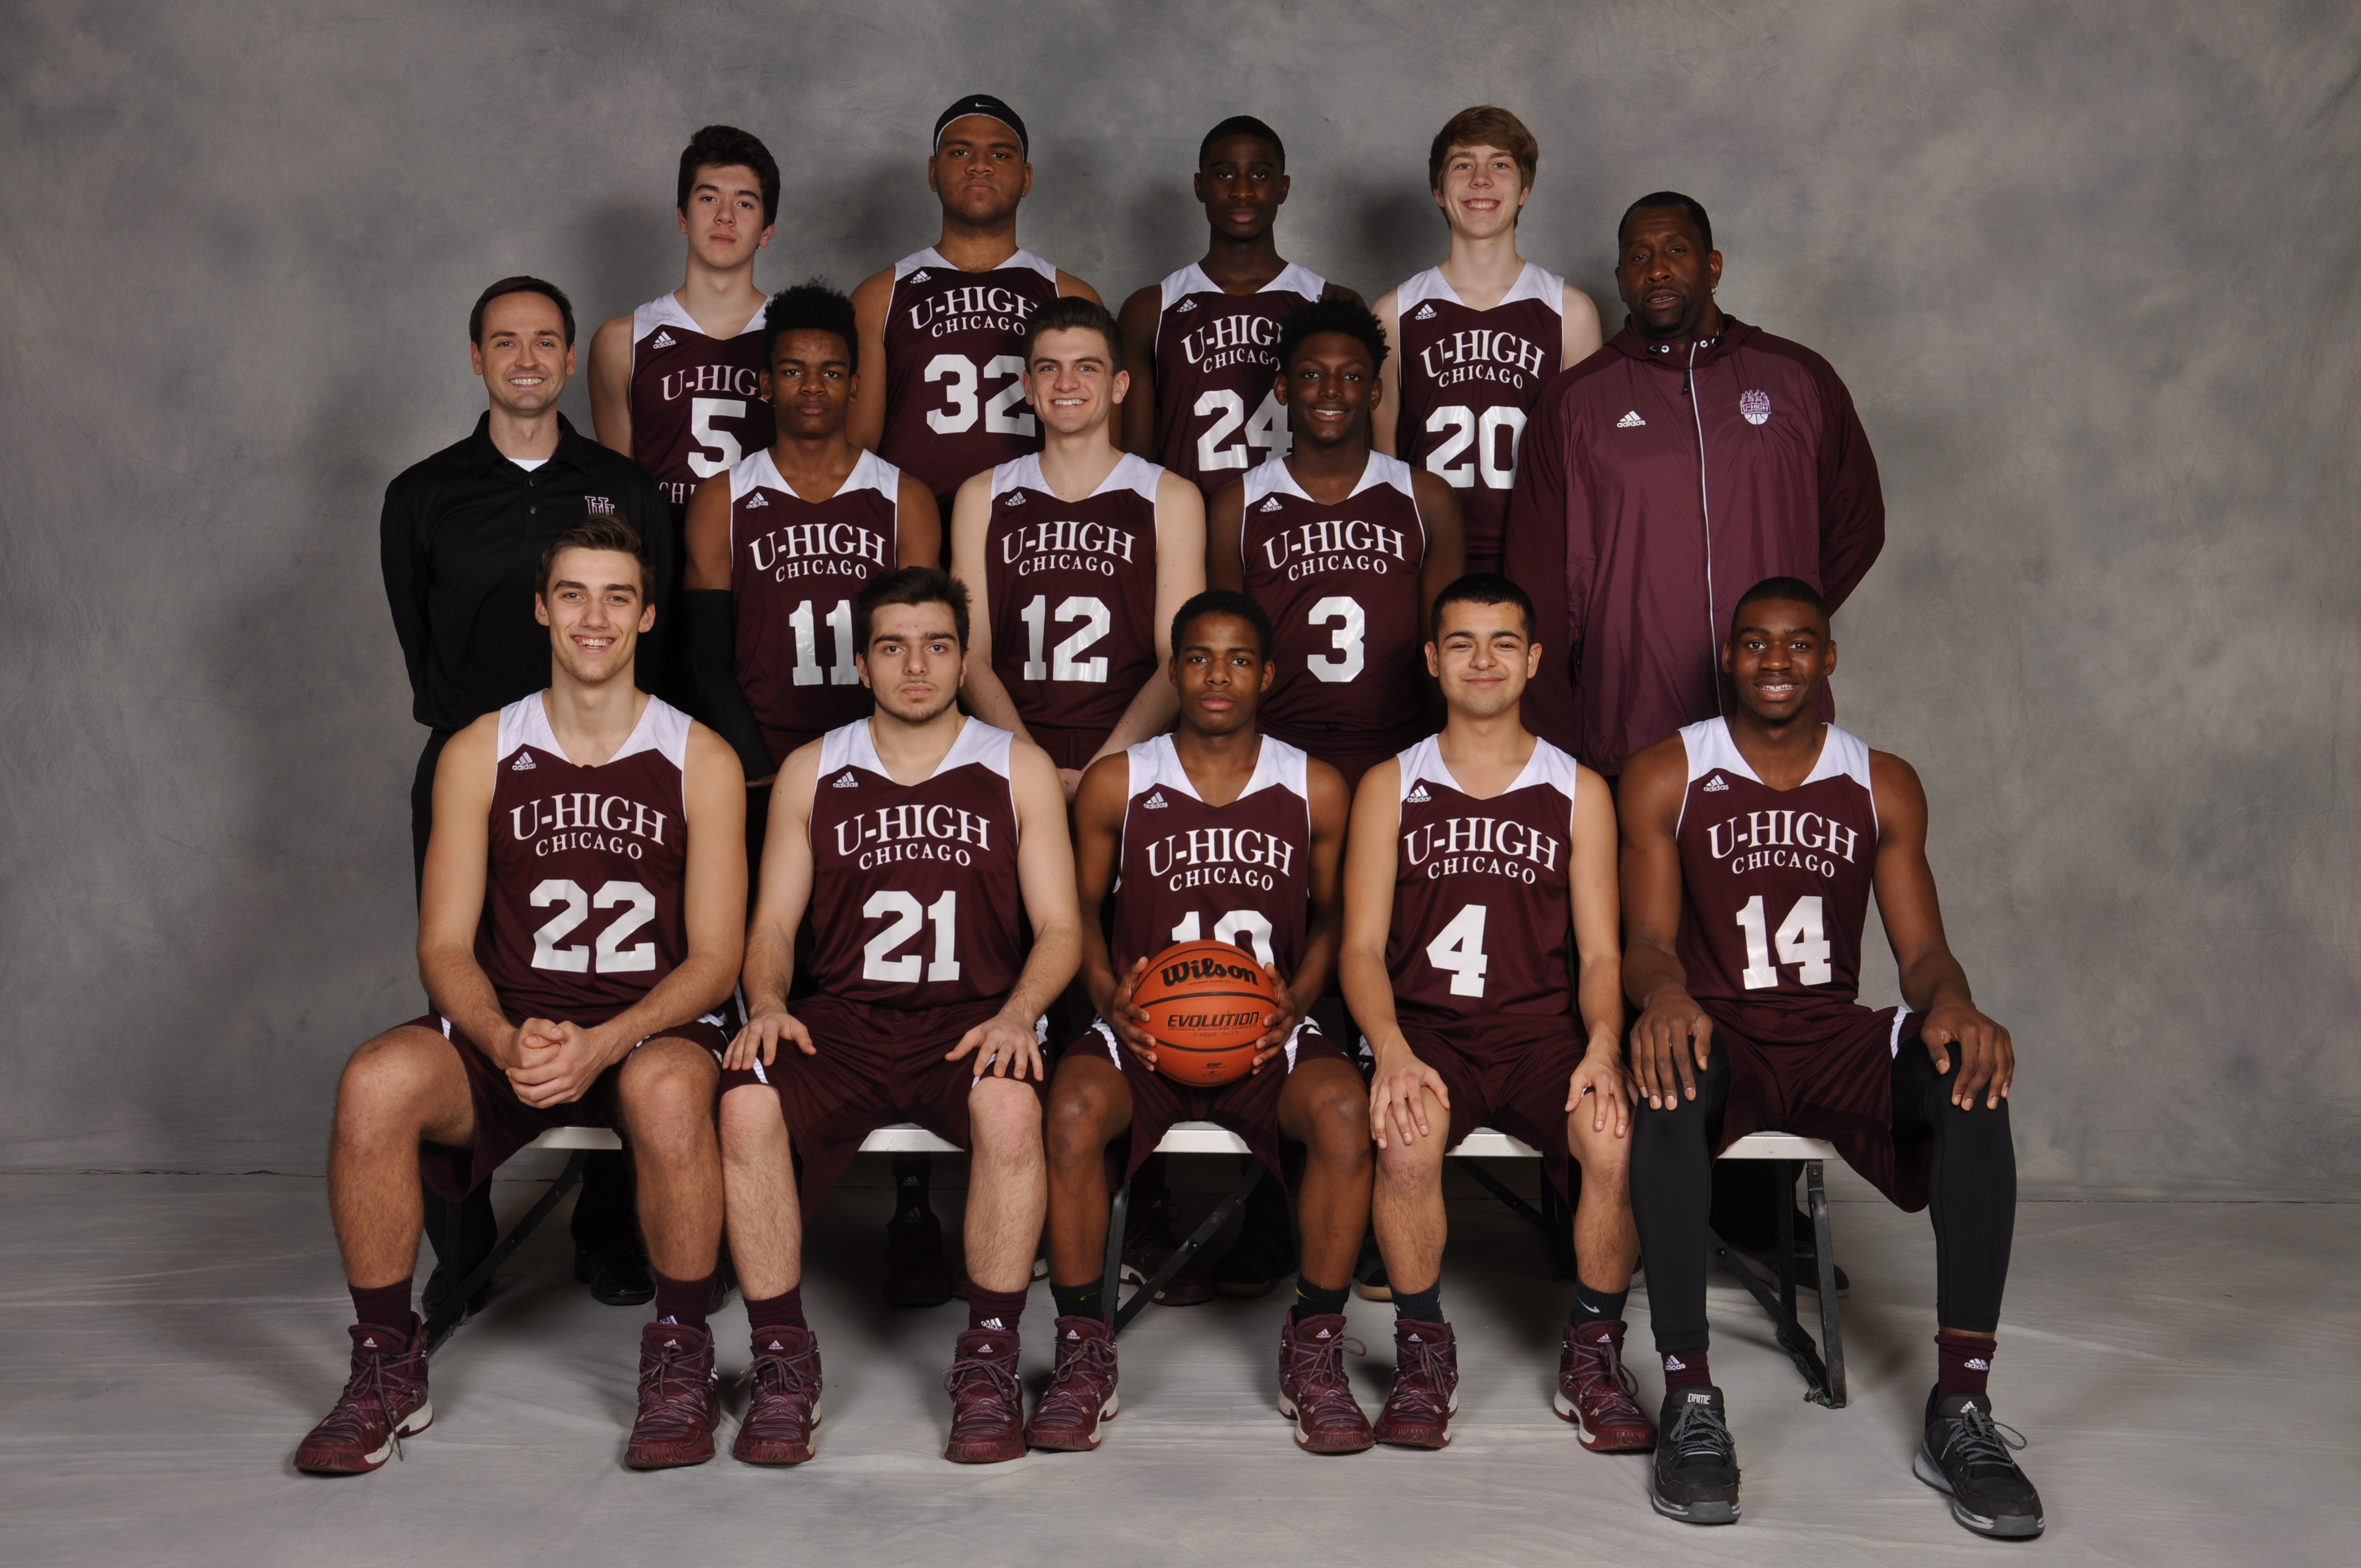 U High Basketball Team Details - Univers...